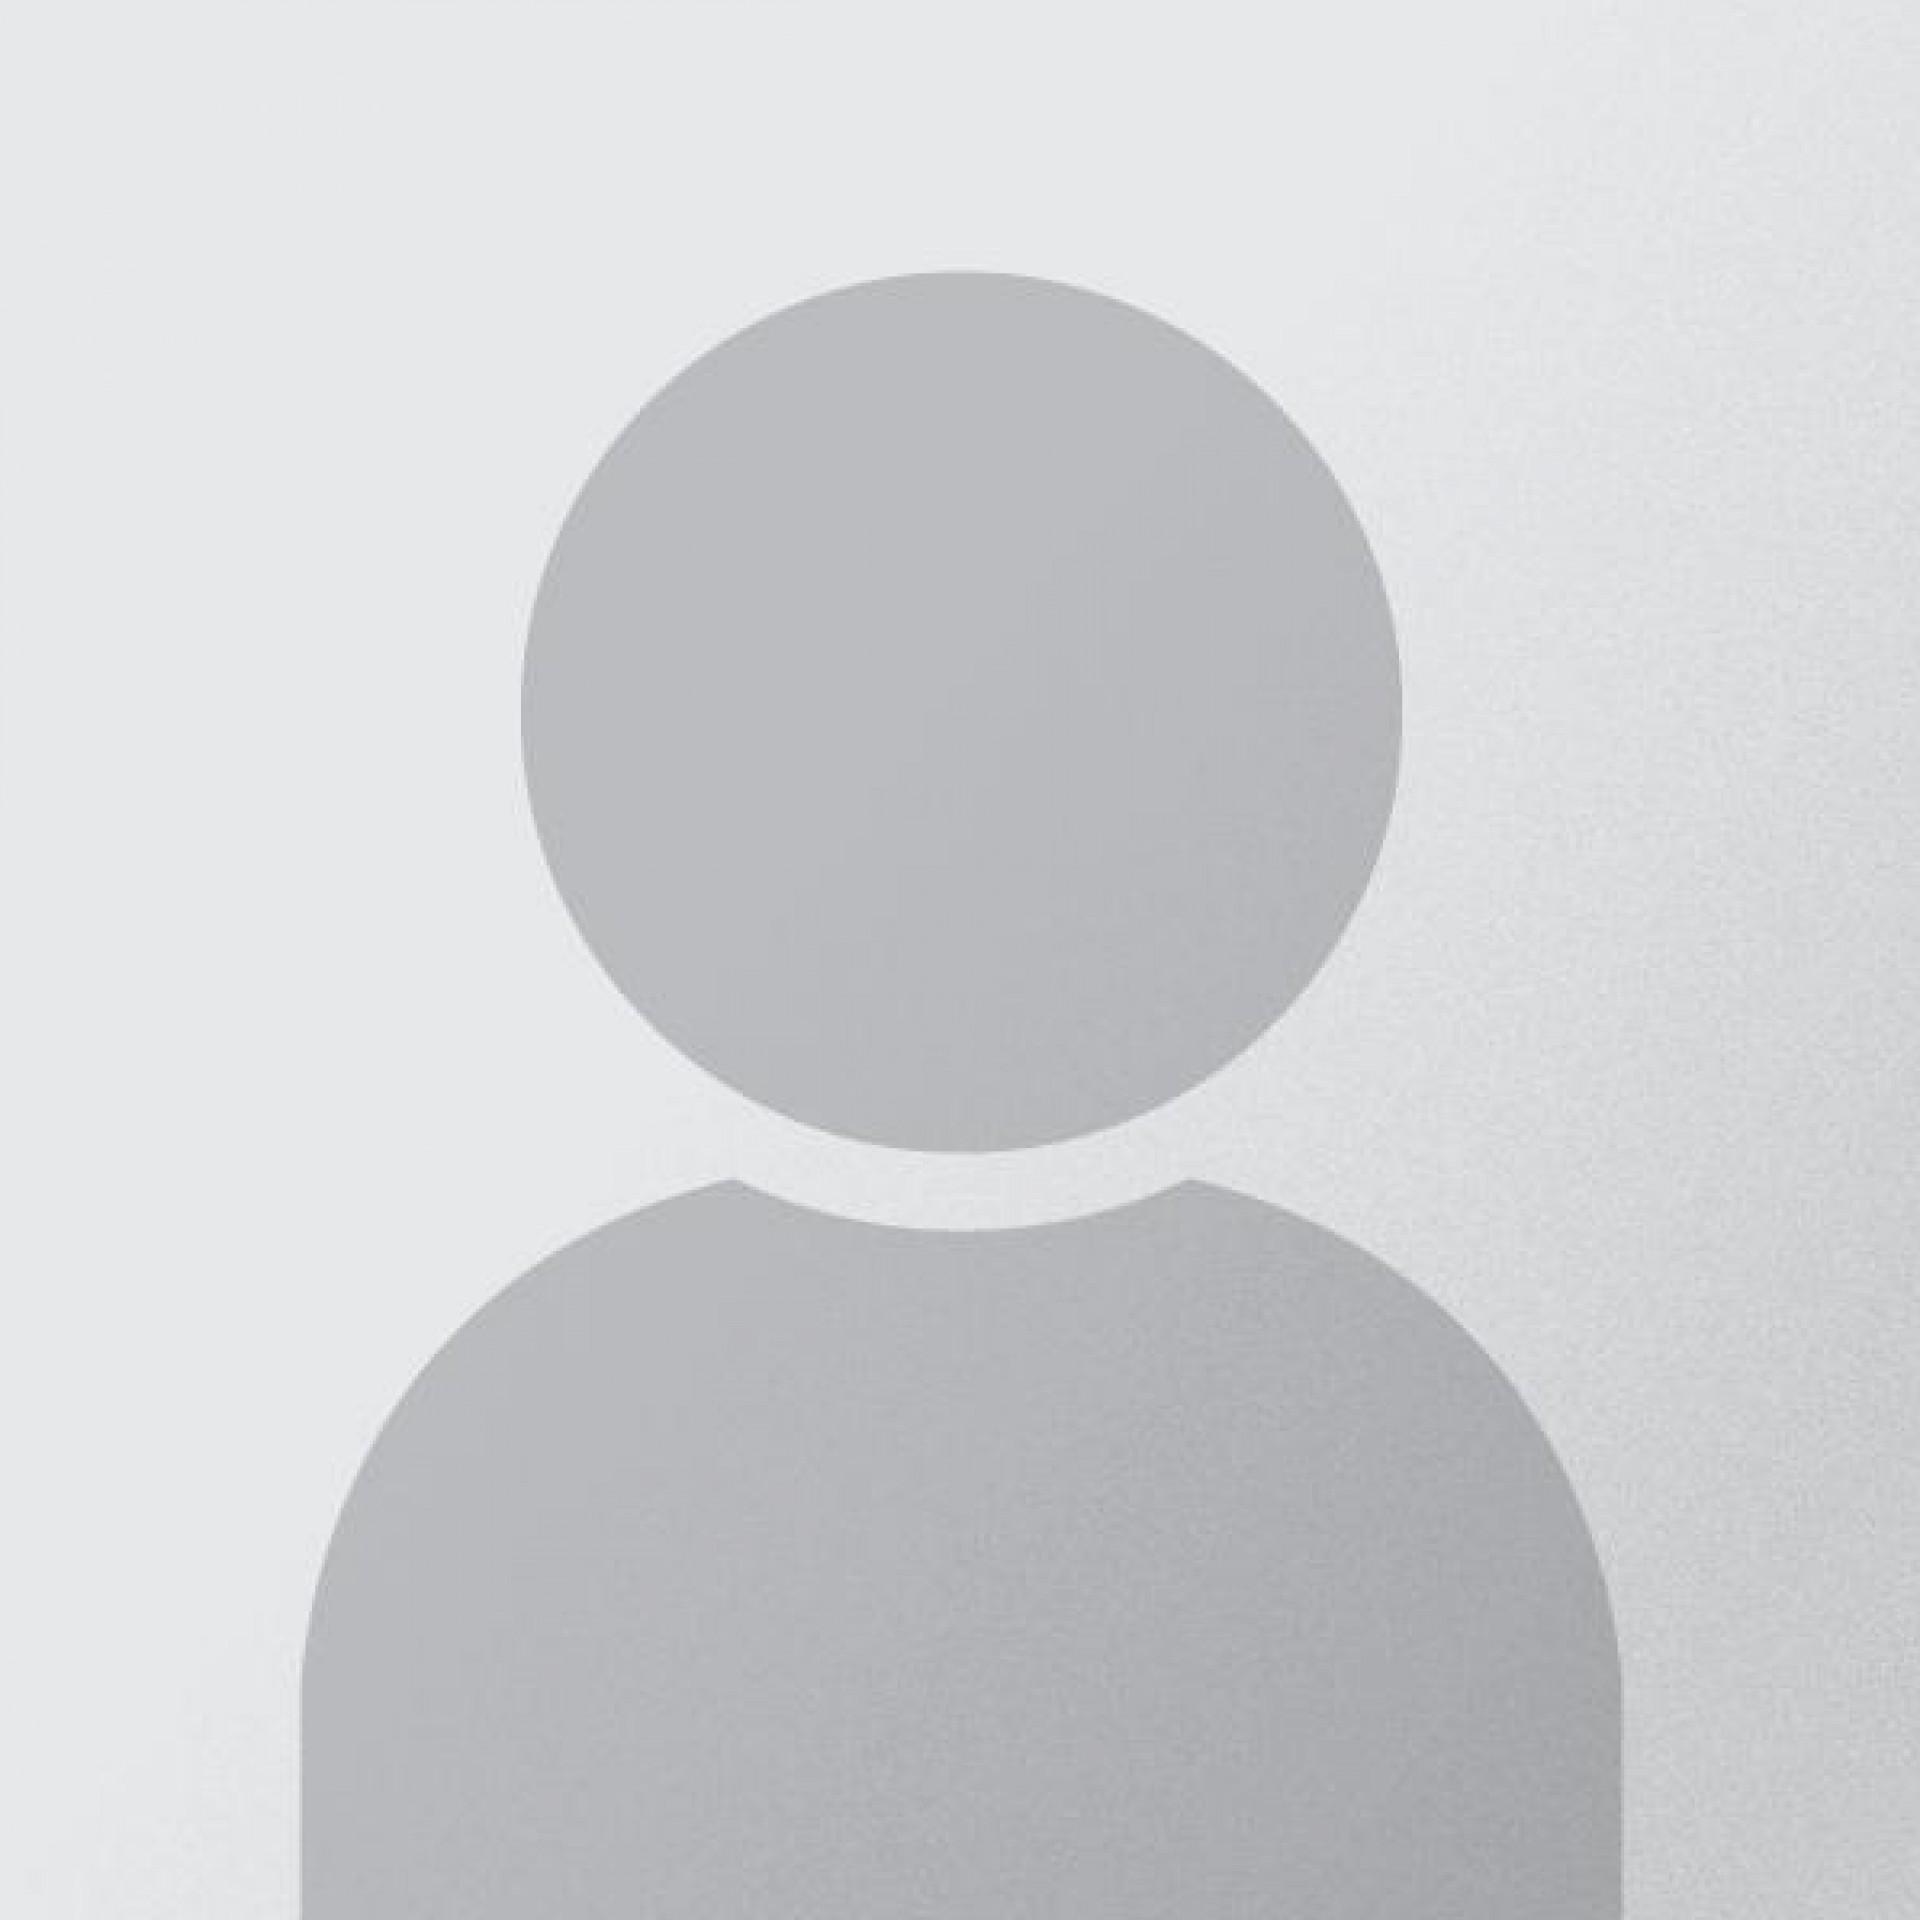 fotografia p021 profilu 0102P91PBN